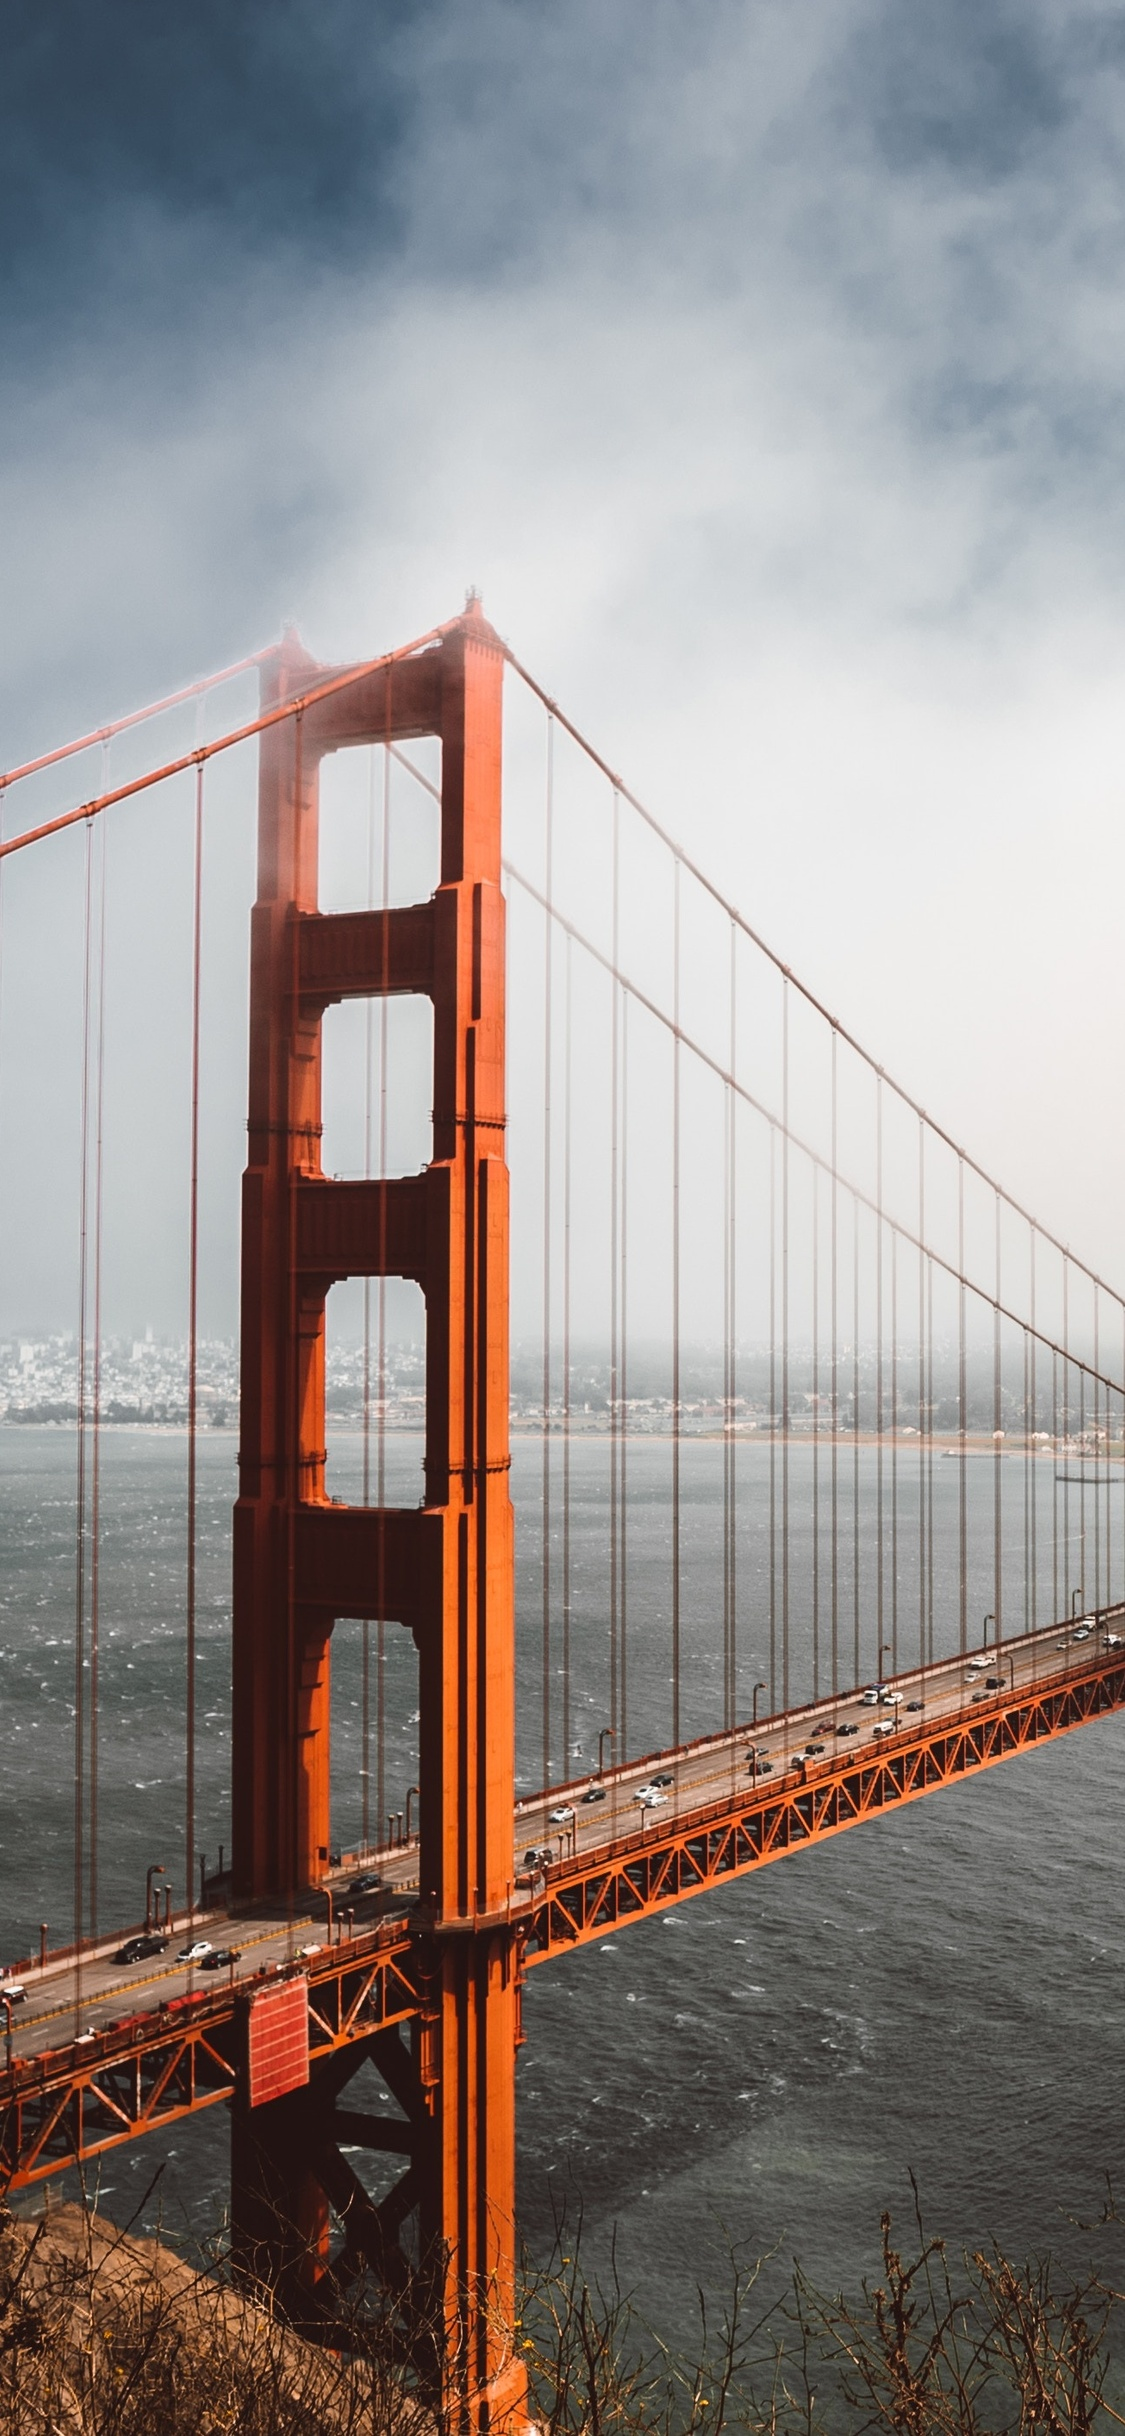 1125x2436 4k Golden Gate Bridge Iphone Xs Iphone 10 Iphone X Hd 4k